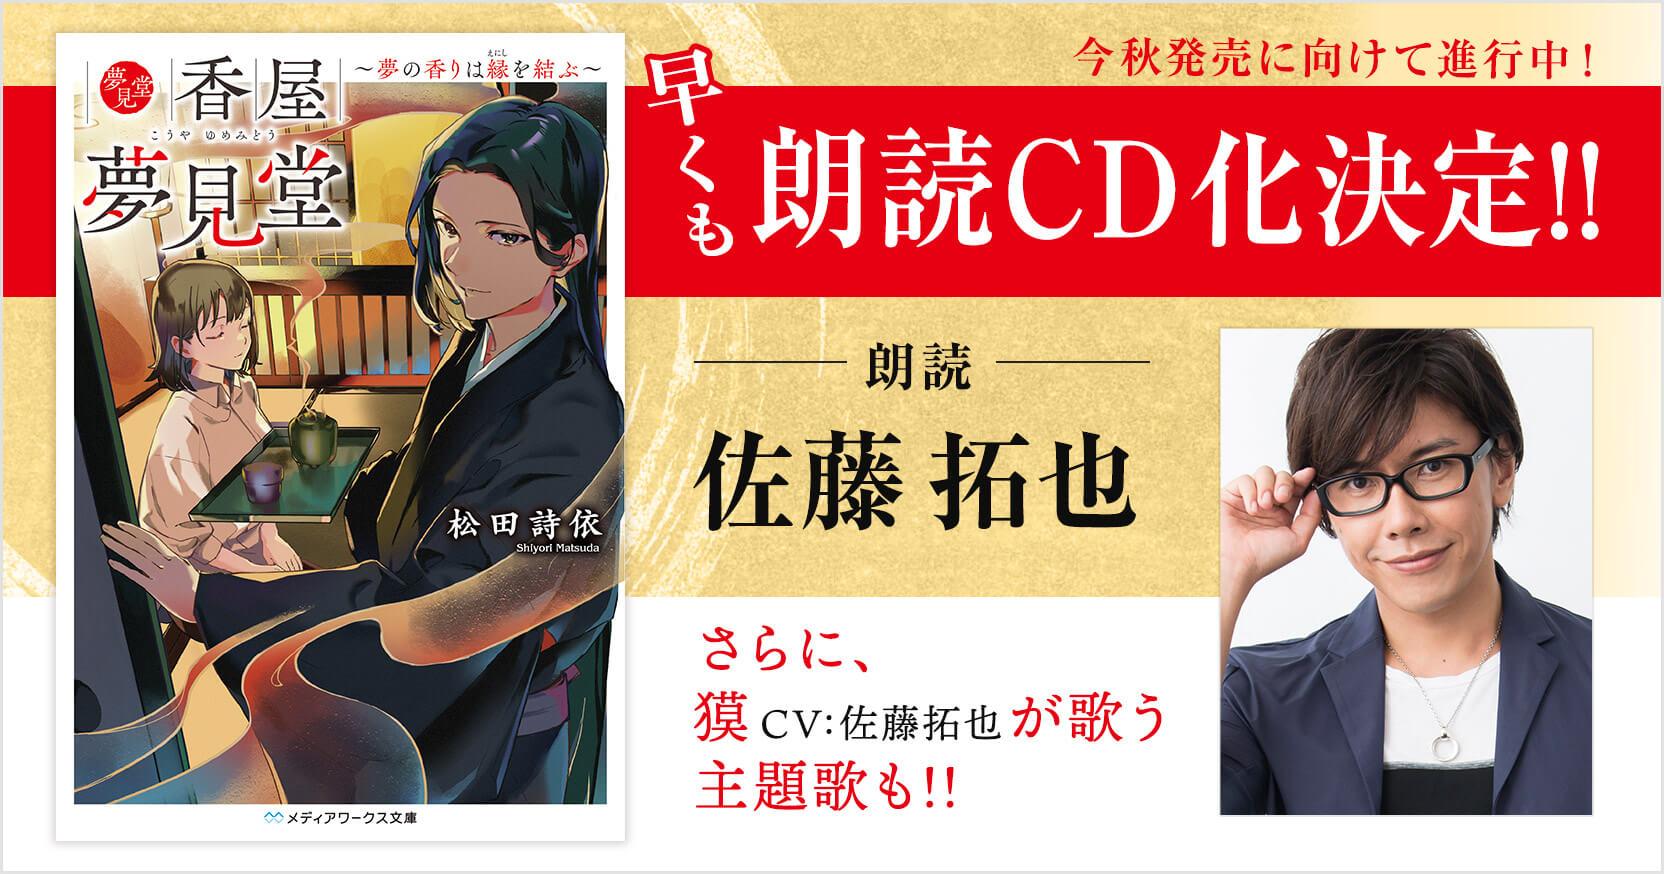 https://storage.googleapis.com/blog-info/entry/2021/08/210825-yumemido_ogp.jpg